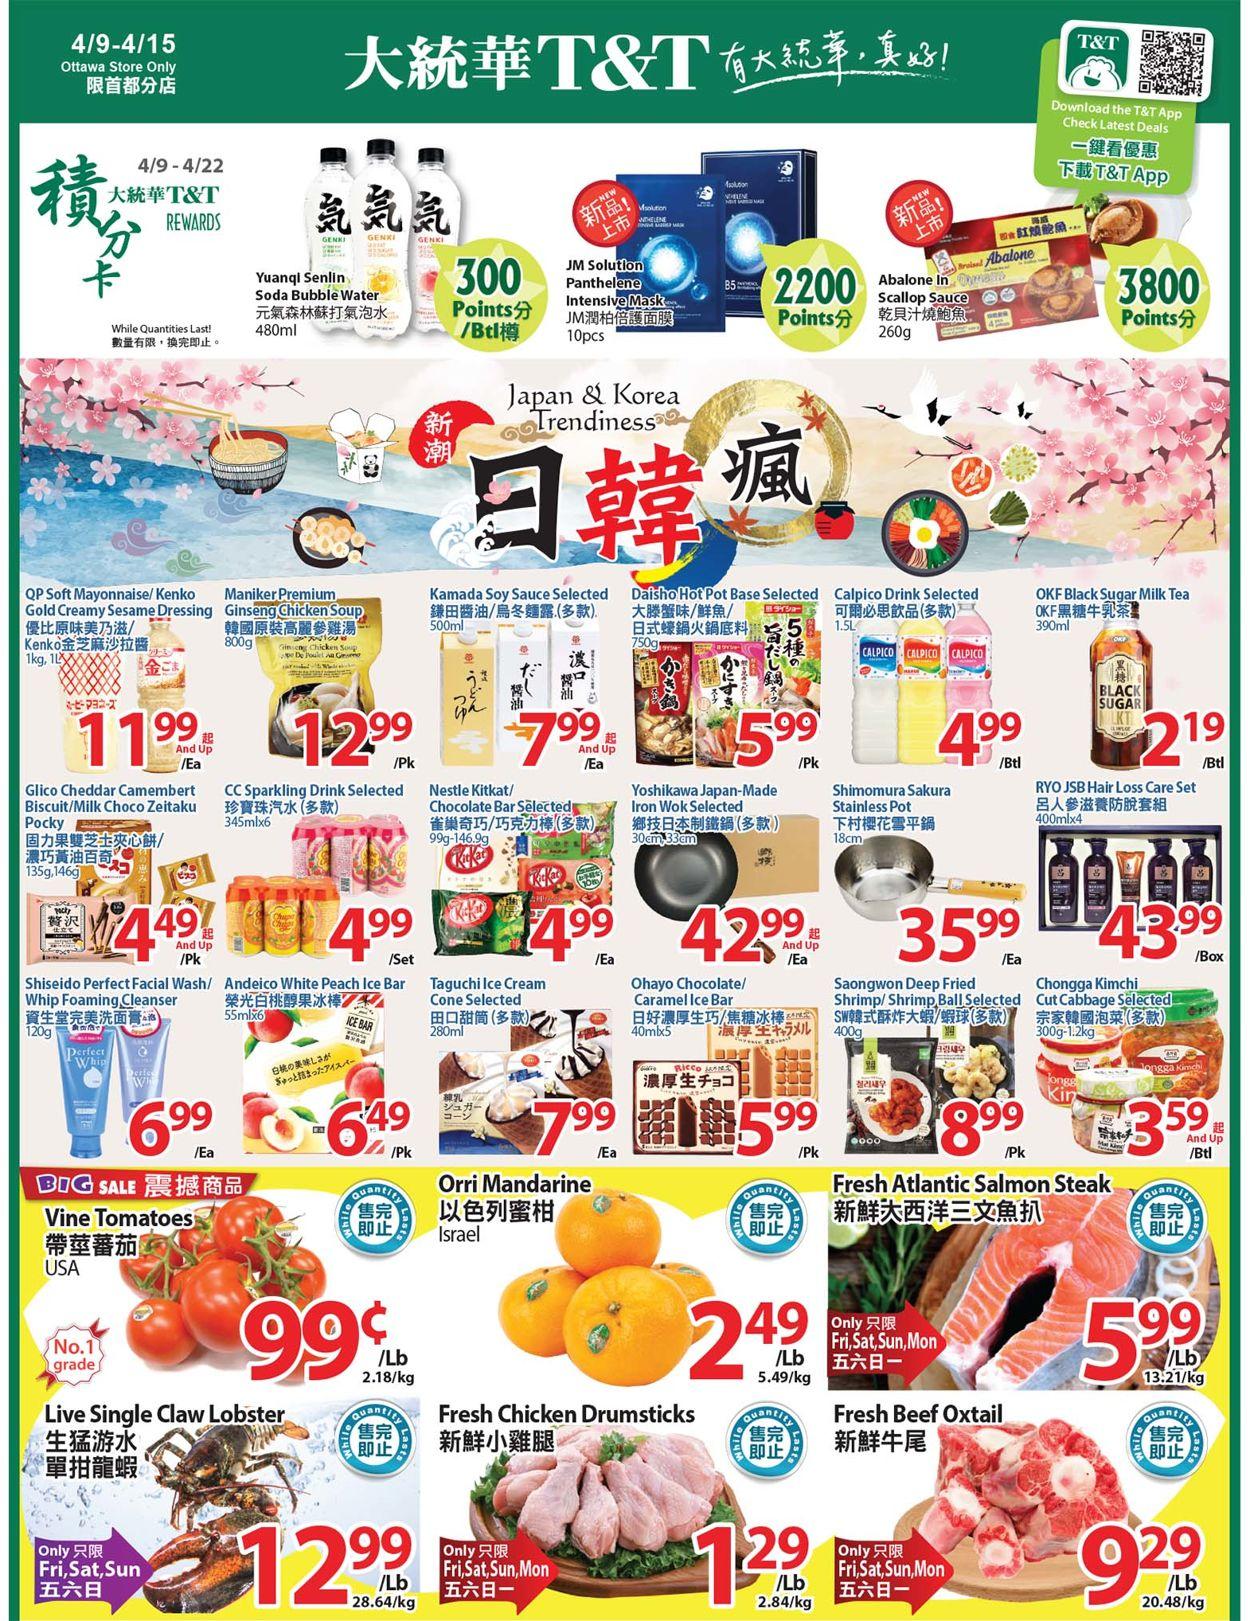 T&T Supermarket - Ottawa Flyer - 04/09-04/15/2021